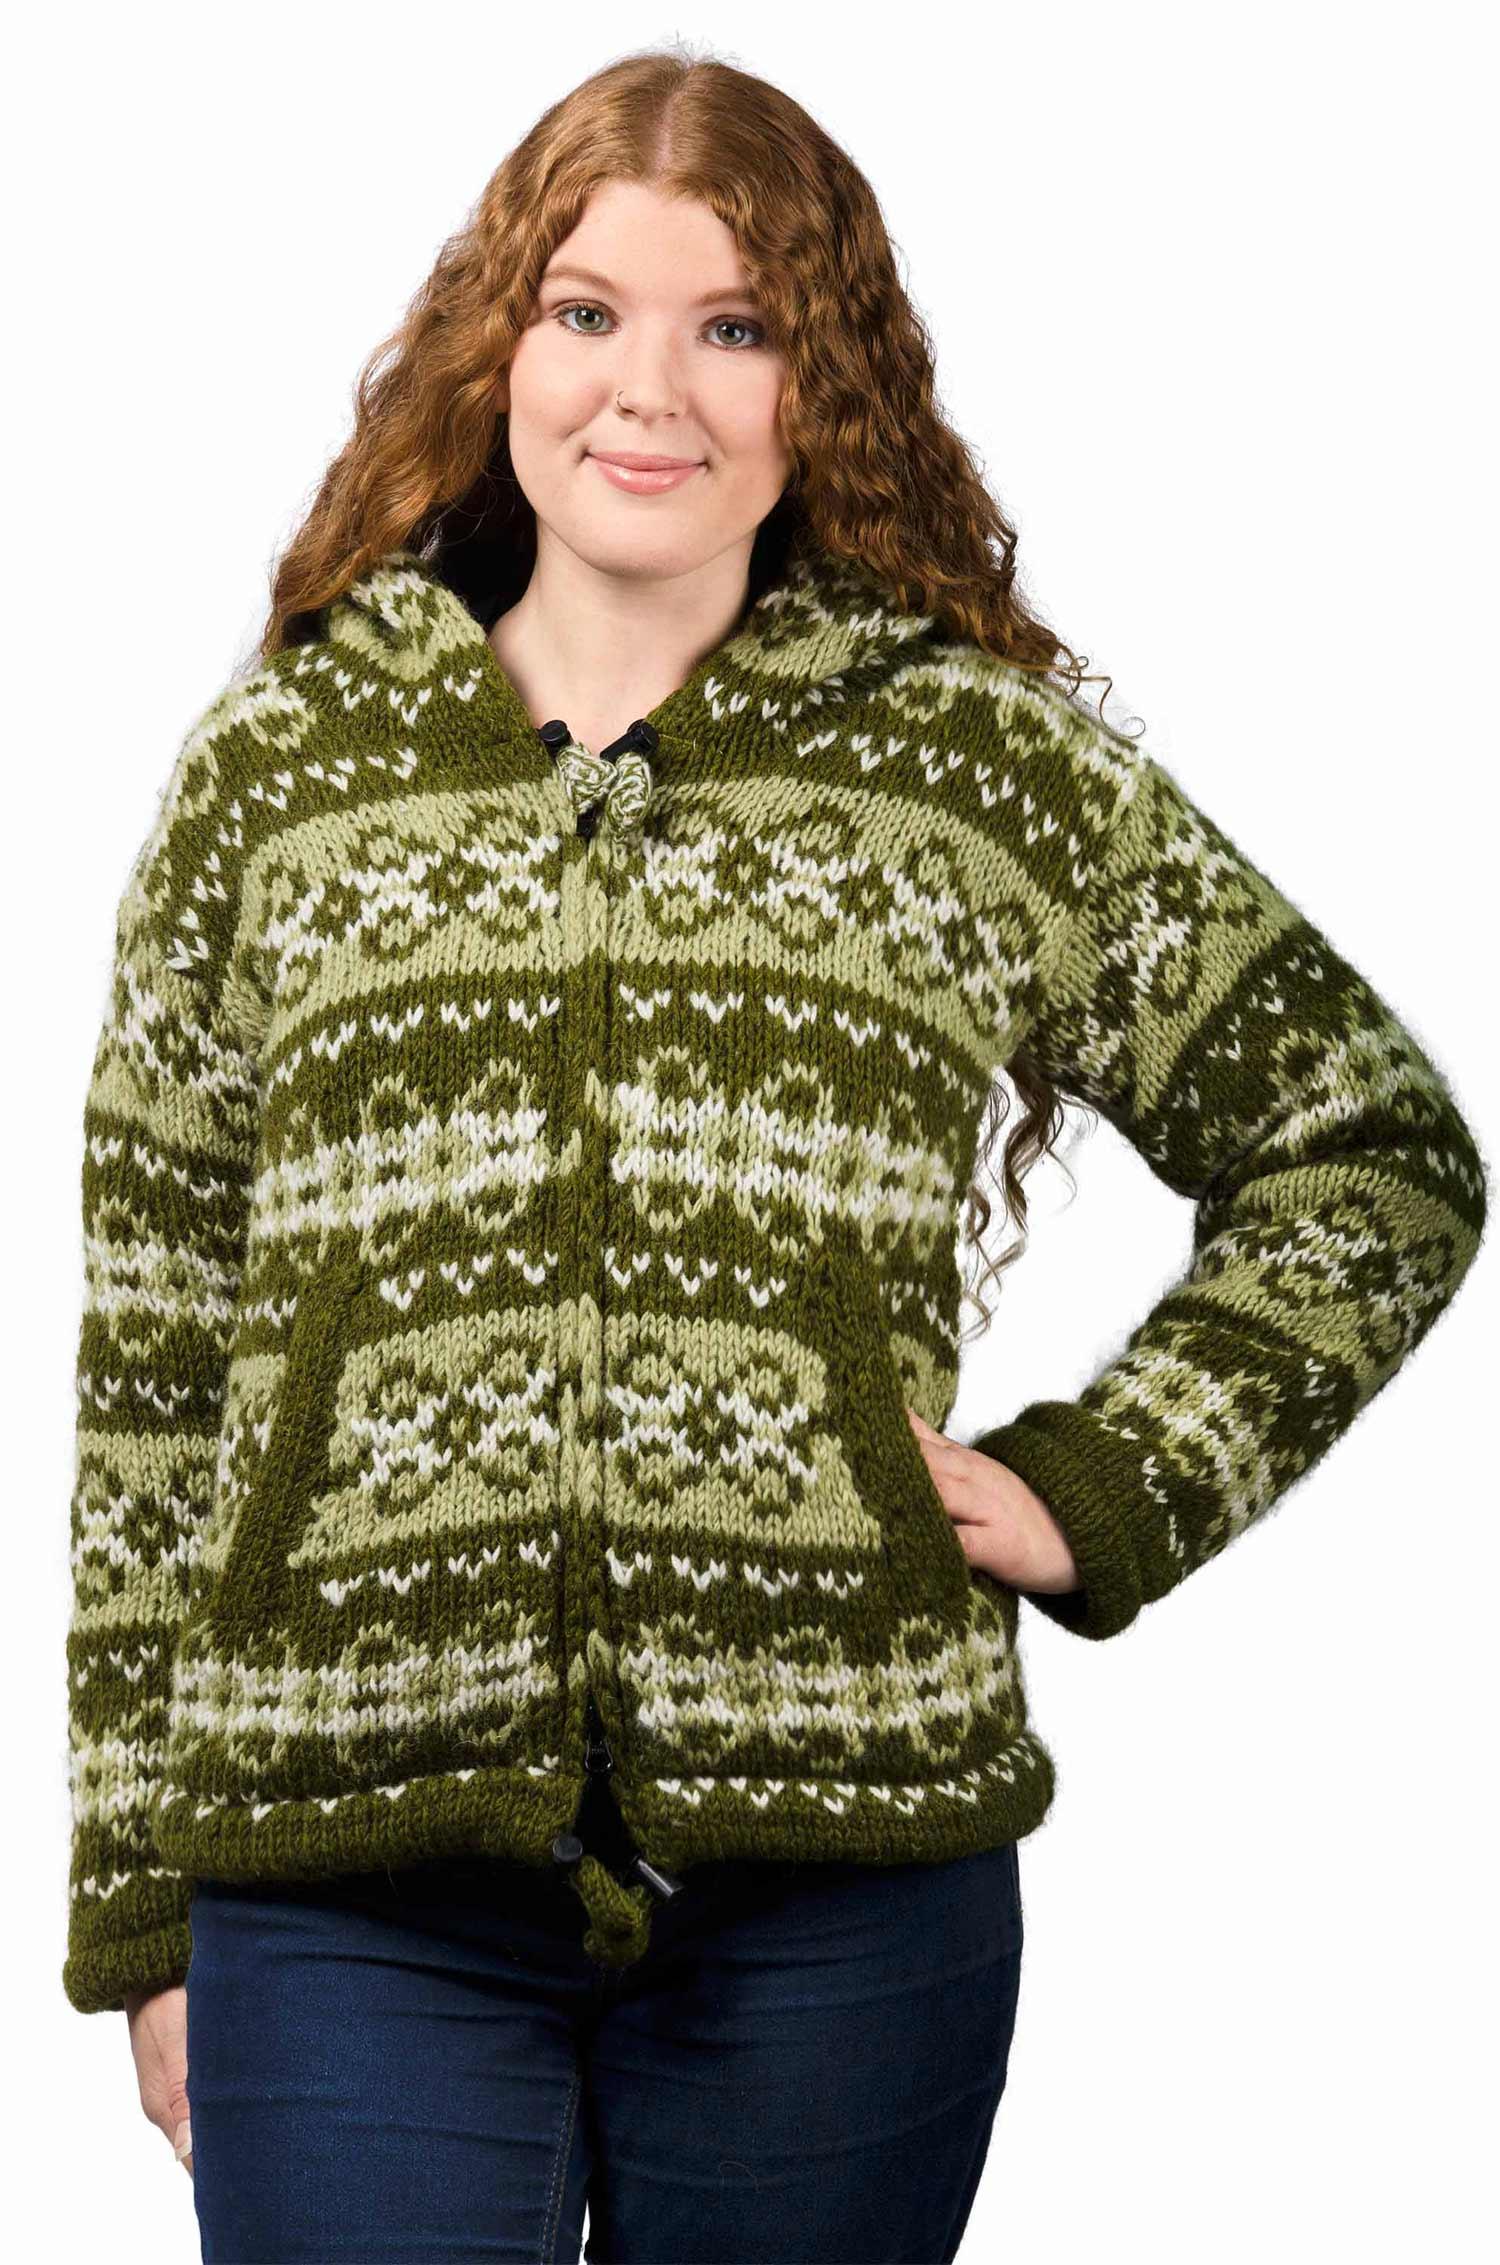 Wool Vintage Himalayan Mountain Jacket Avocado & Olive